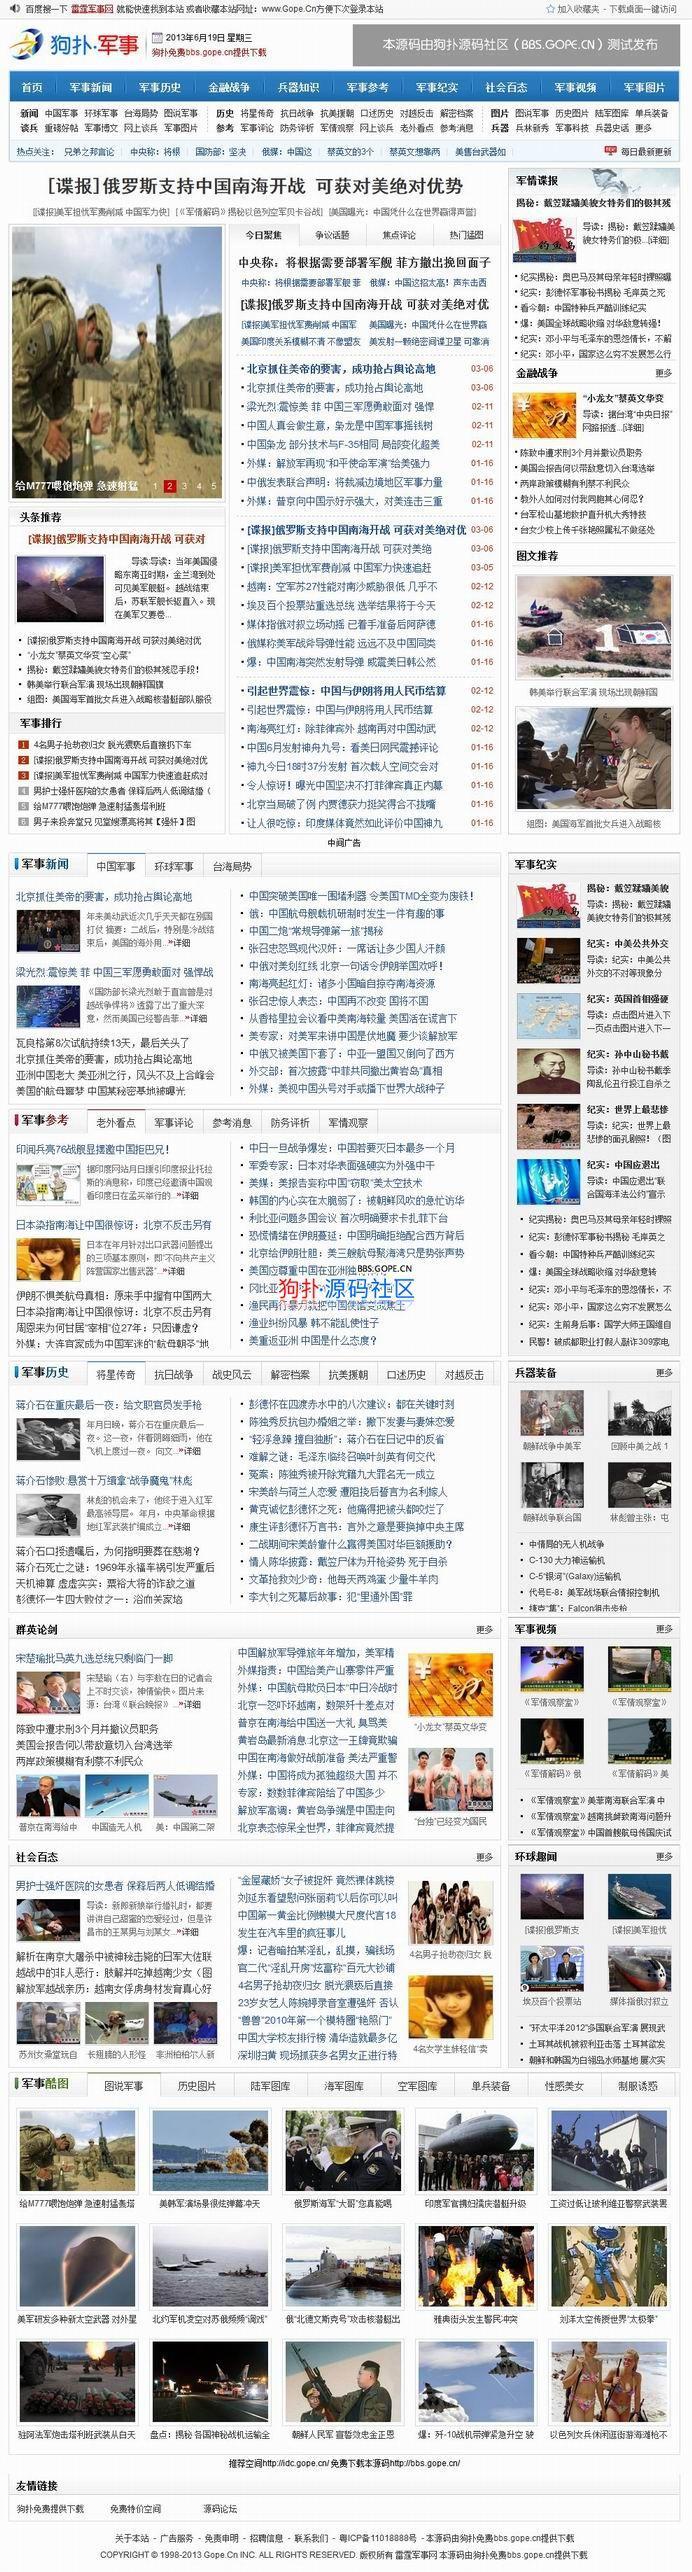 【php】某大型军事门户源码,仿雷霆001军事网,含数据+采集,价值800元